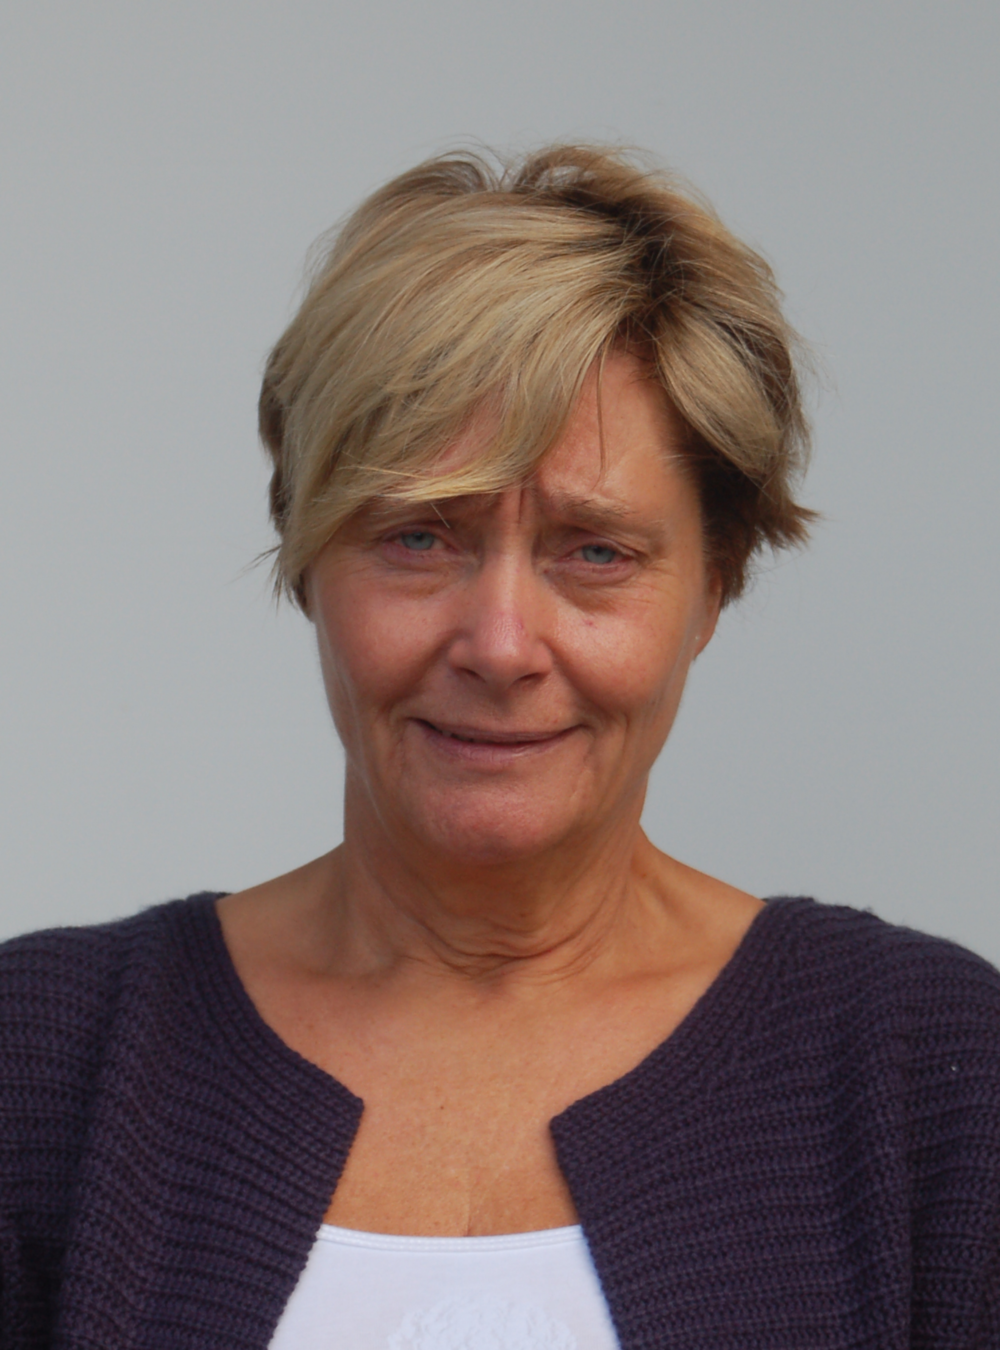 Britt Øverhus Linjelærer Cosplay.Britt kom til Grong i 1982 som kunst- og formingslærer. Hun har lang erfaring fra mange ulike linjer, bl.a. kunstlinje og klær/design-linje.